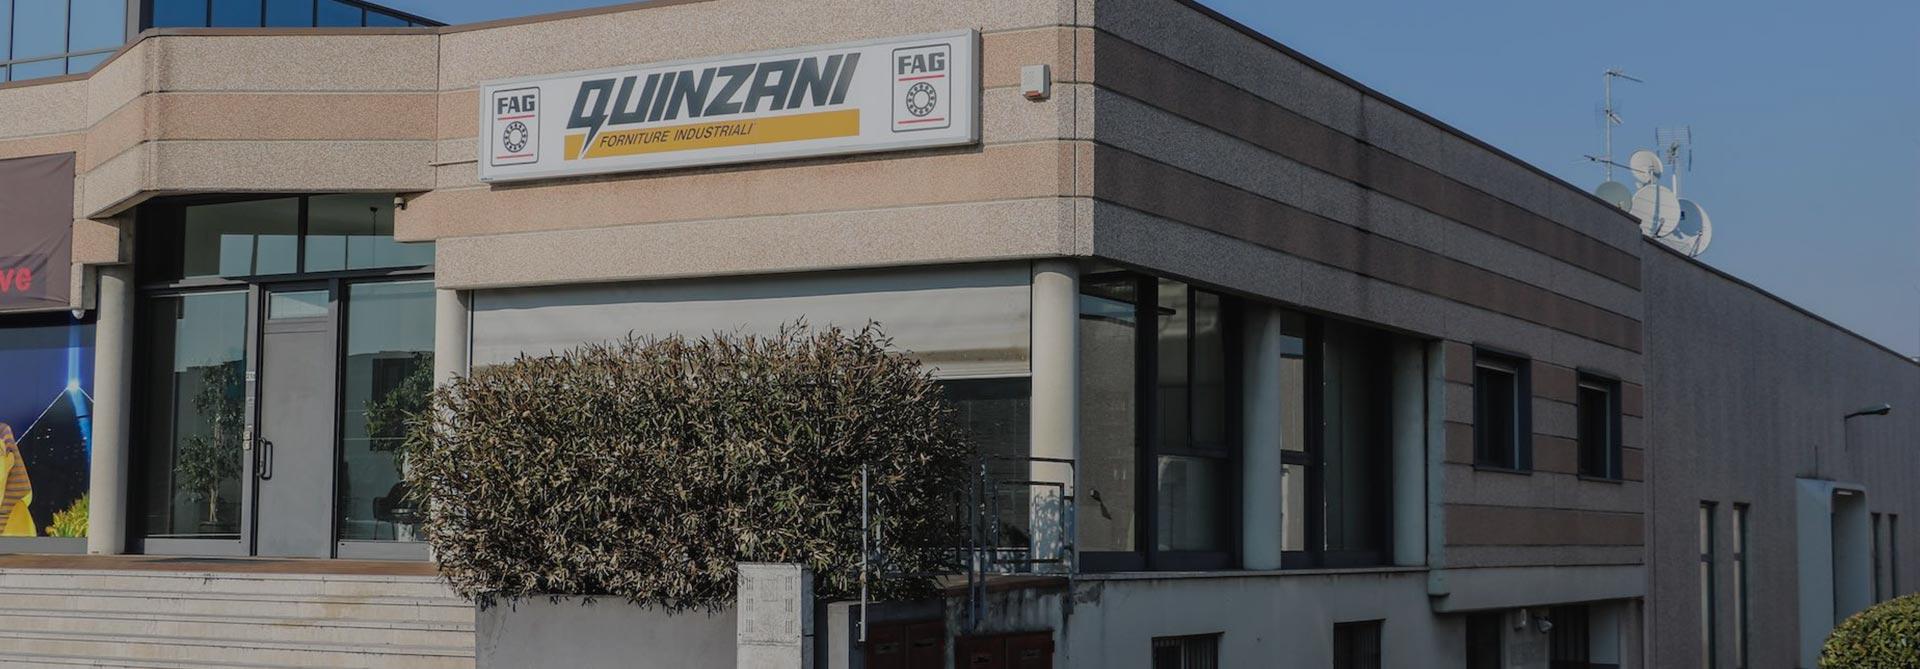 slider-quinzani-1